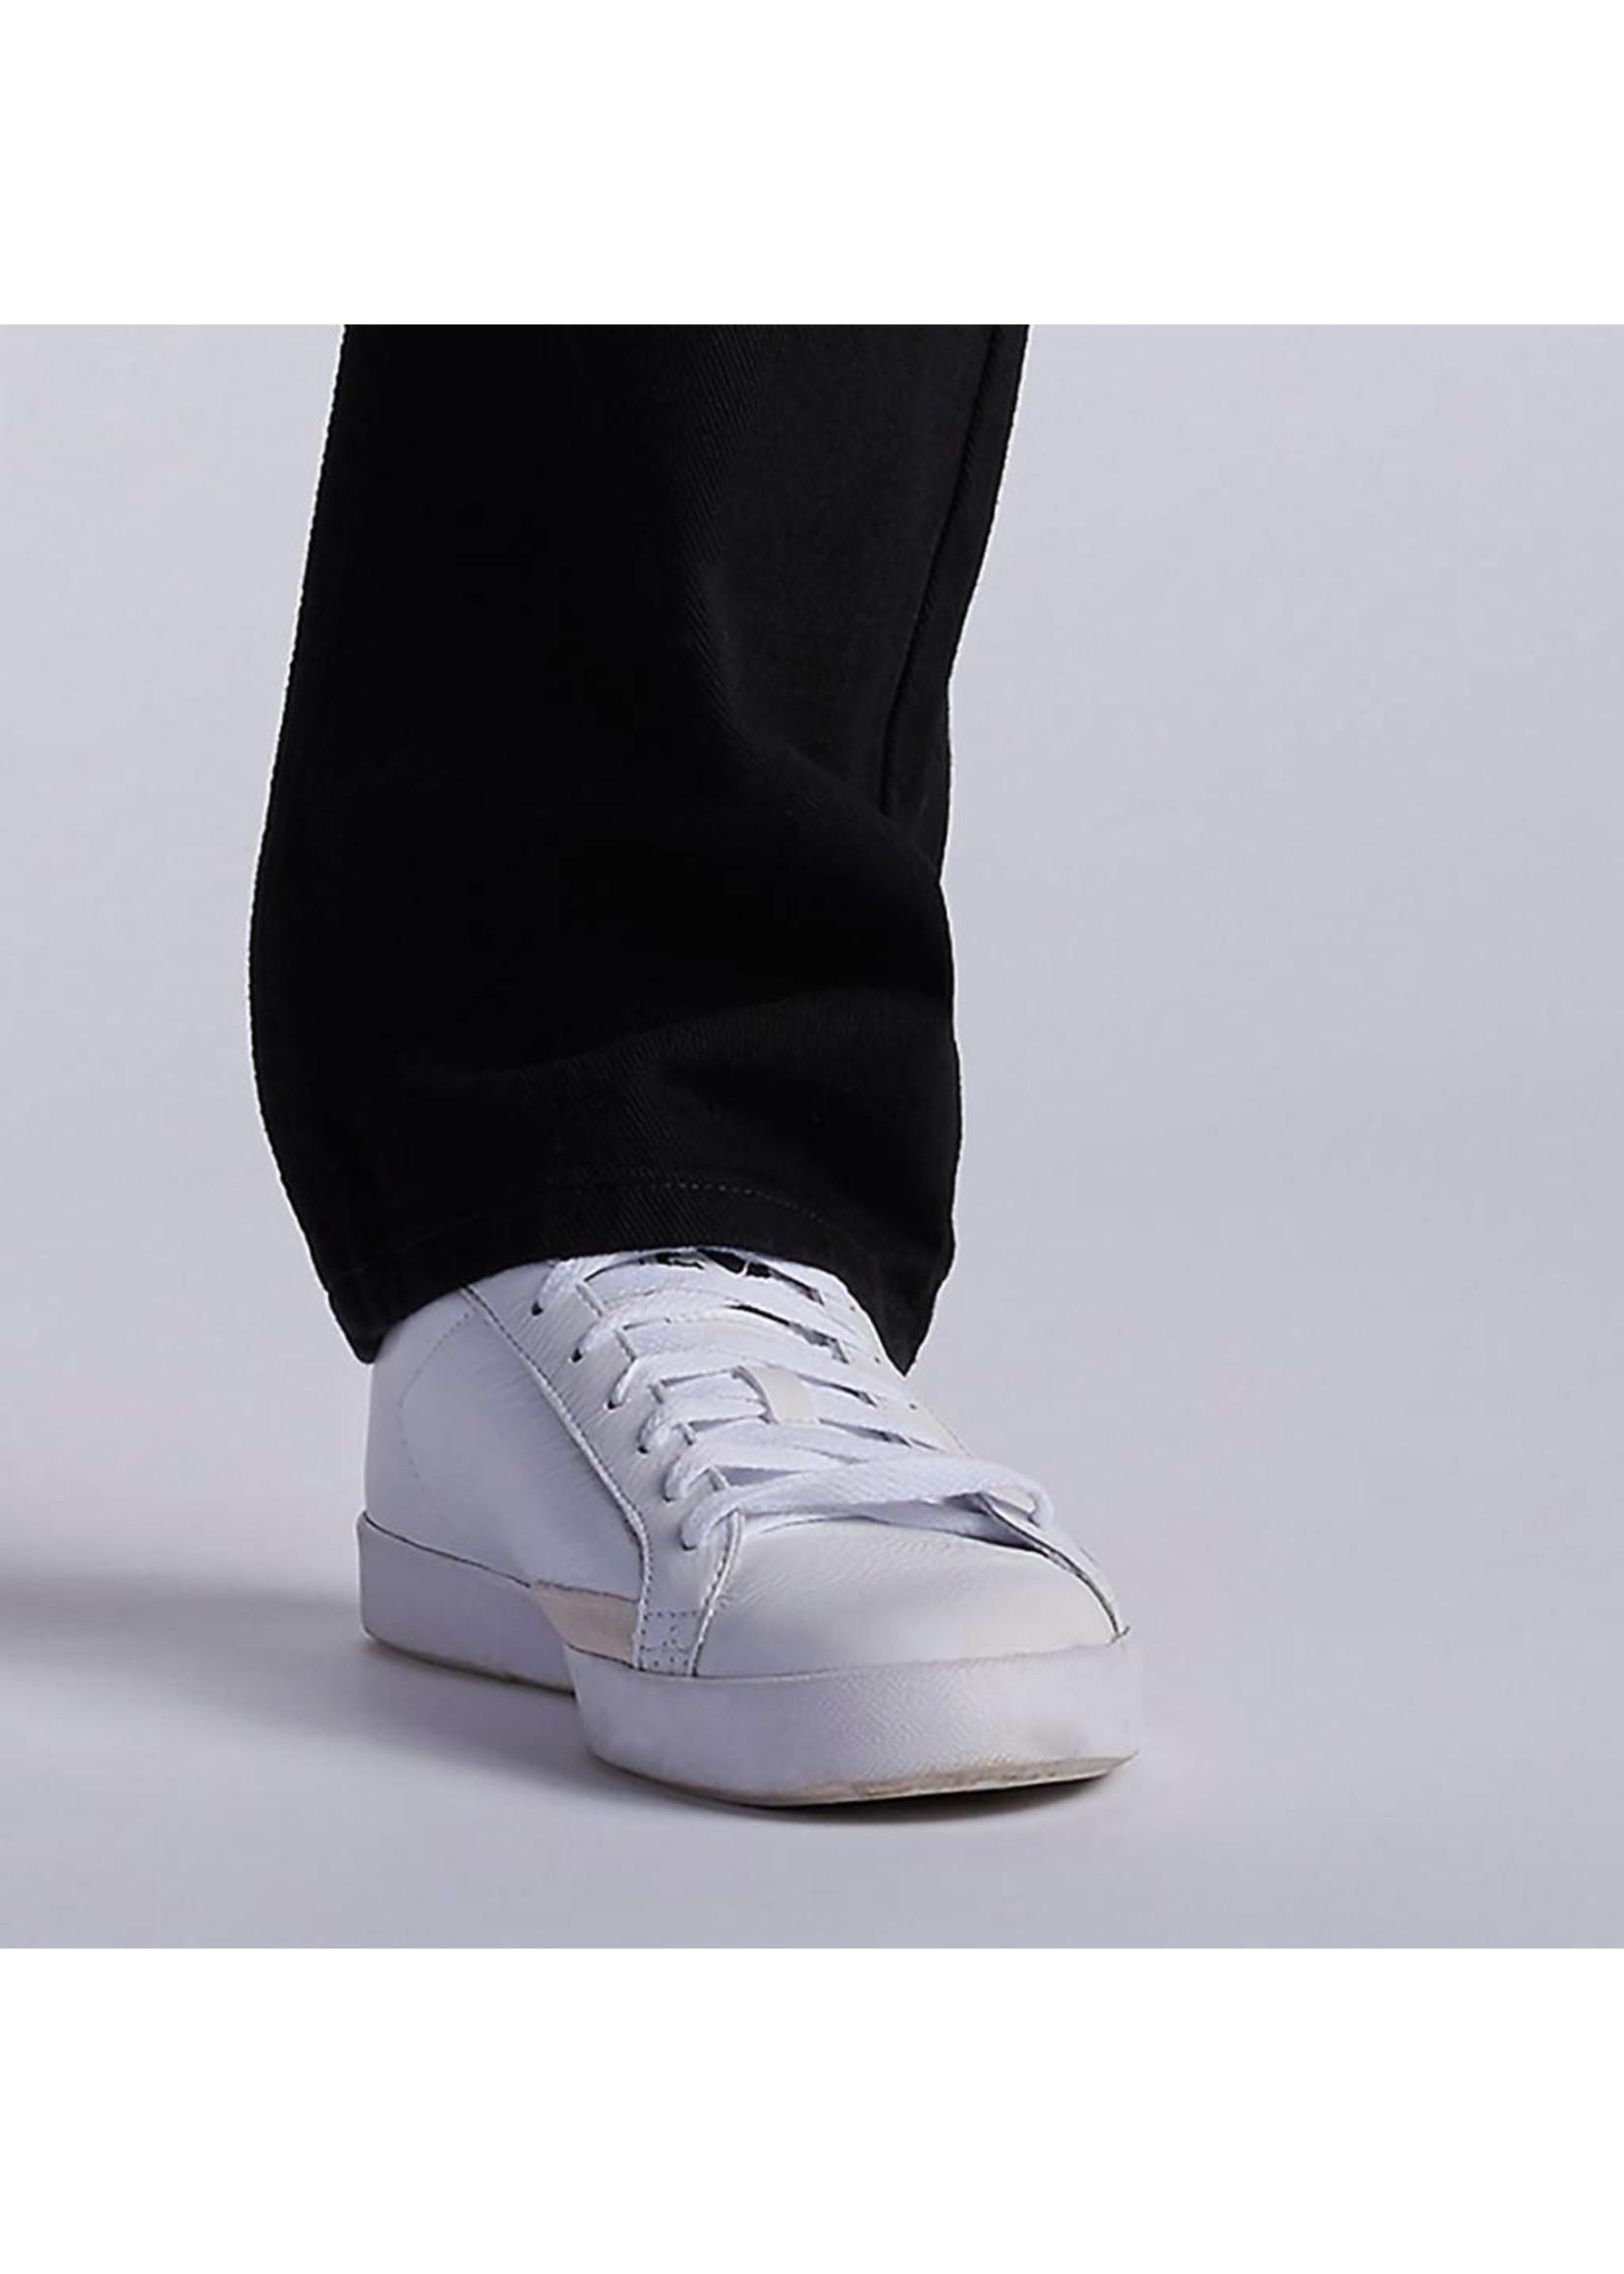 Lee REGULAR FIT STRAIGHT LEG JEANS 2008908